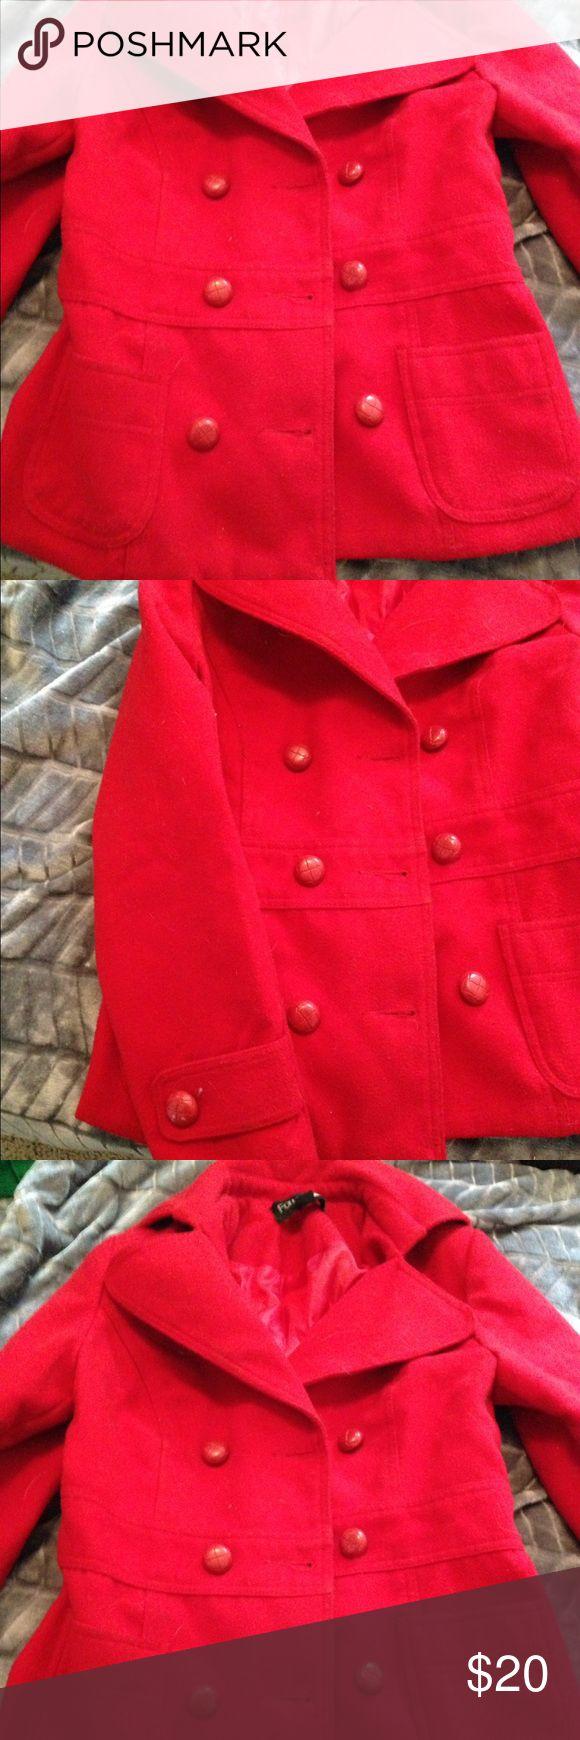 Red pea coat Used red pea coat Forever 21 Jackets & Coats Pea Coats